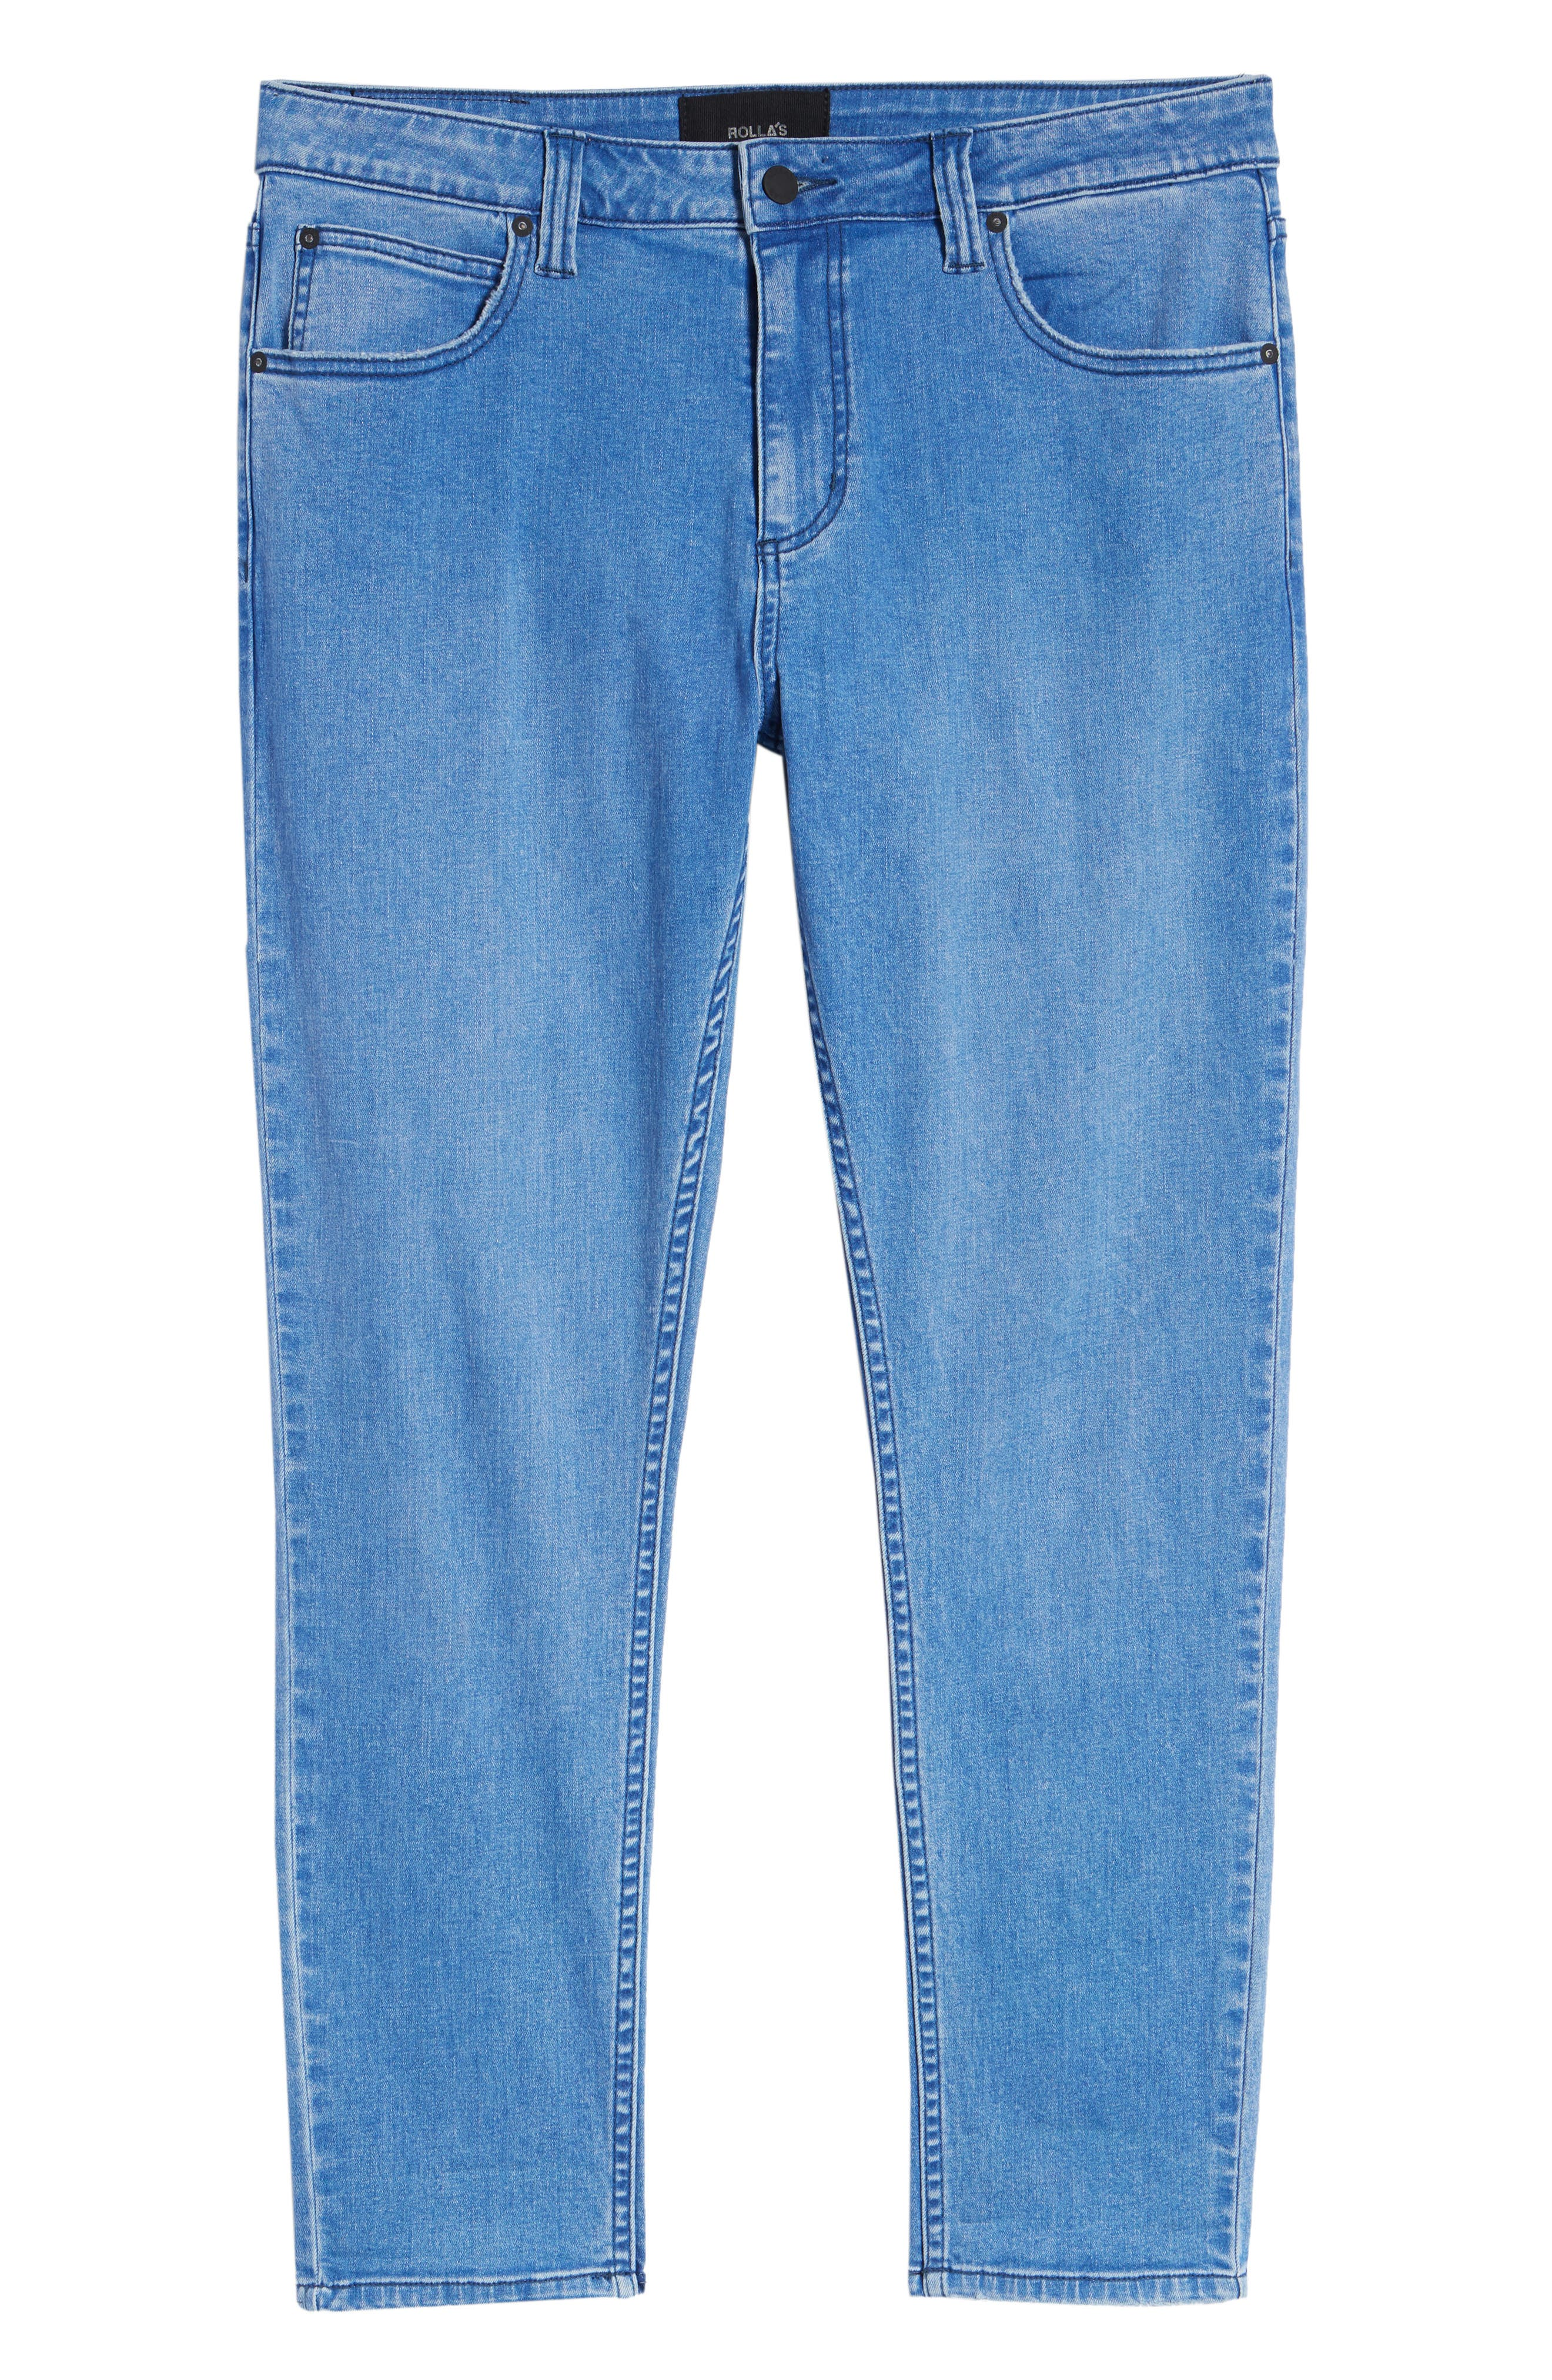 Rollies Slim Fit Jeans,                             Alternate thumbnail 6, color,                             BOLD BLUE